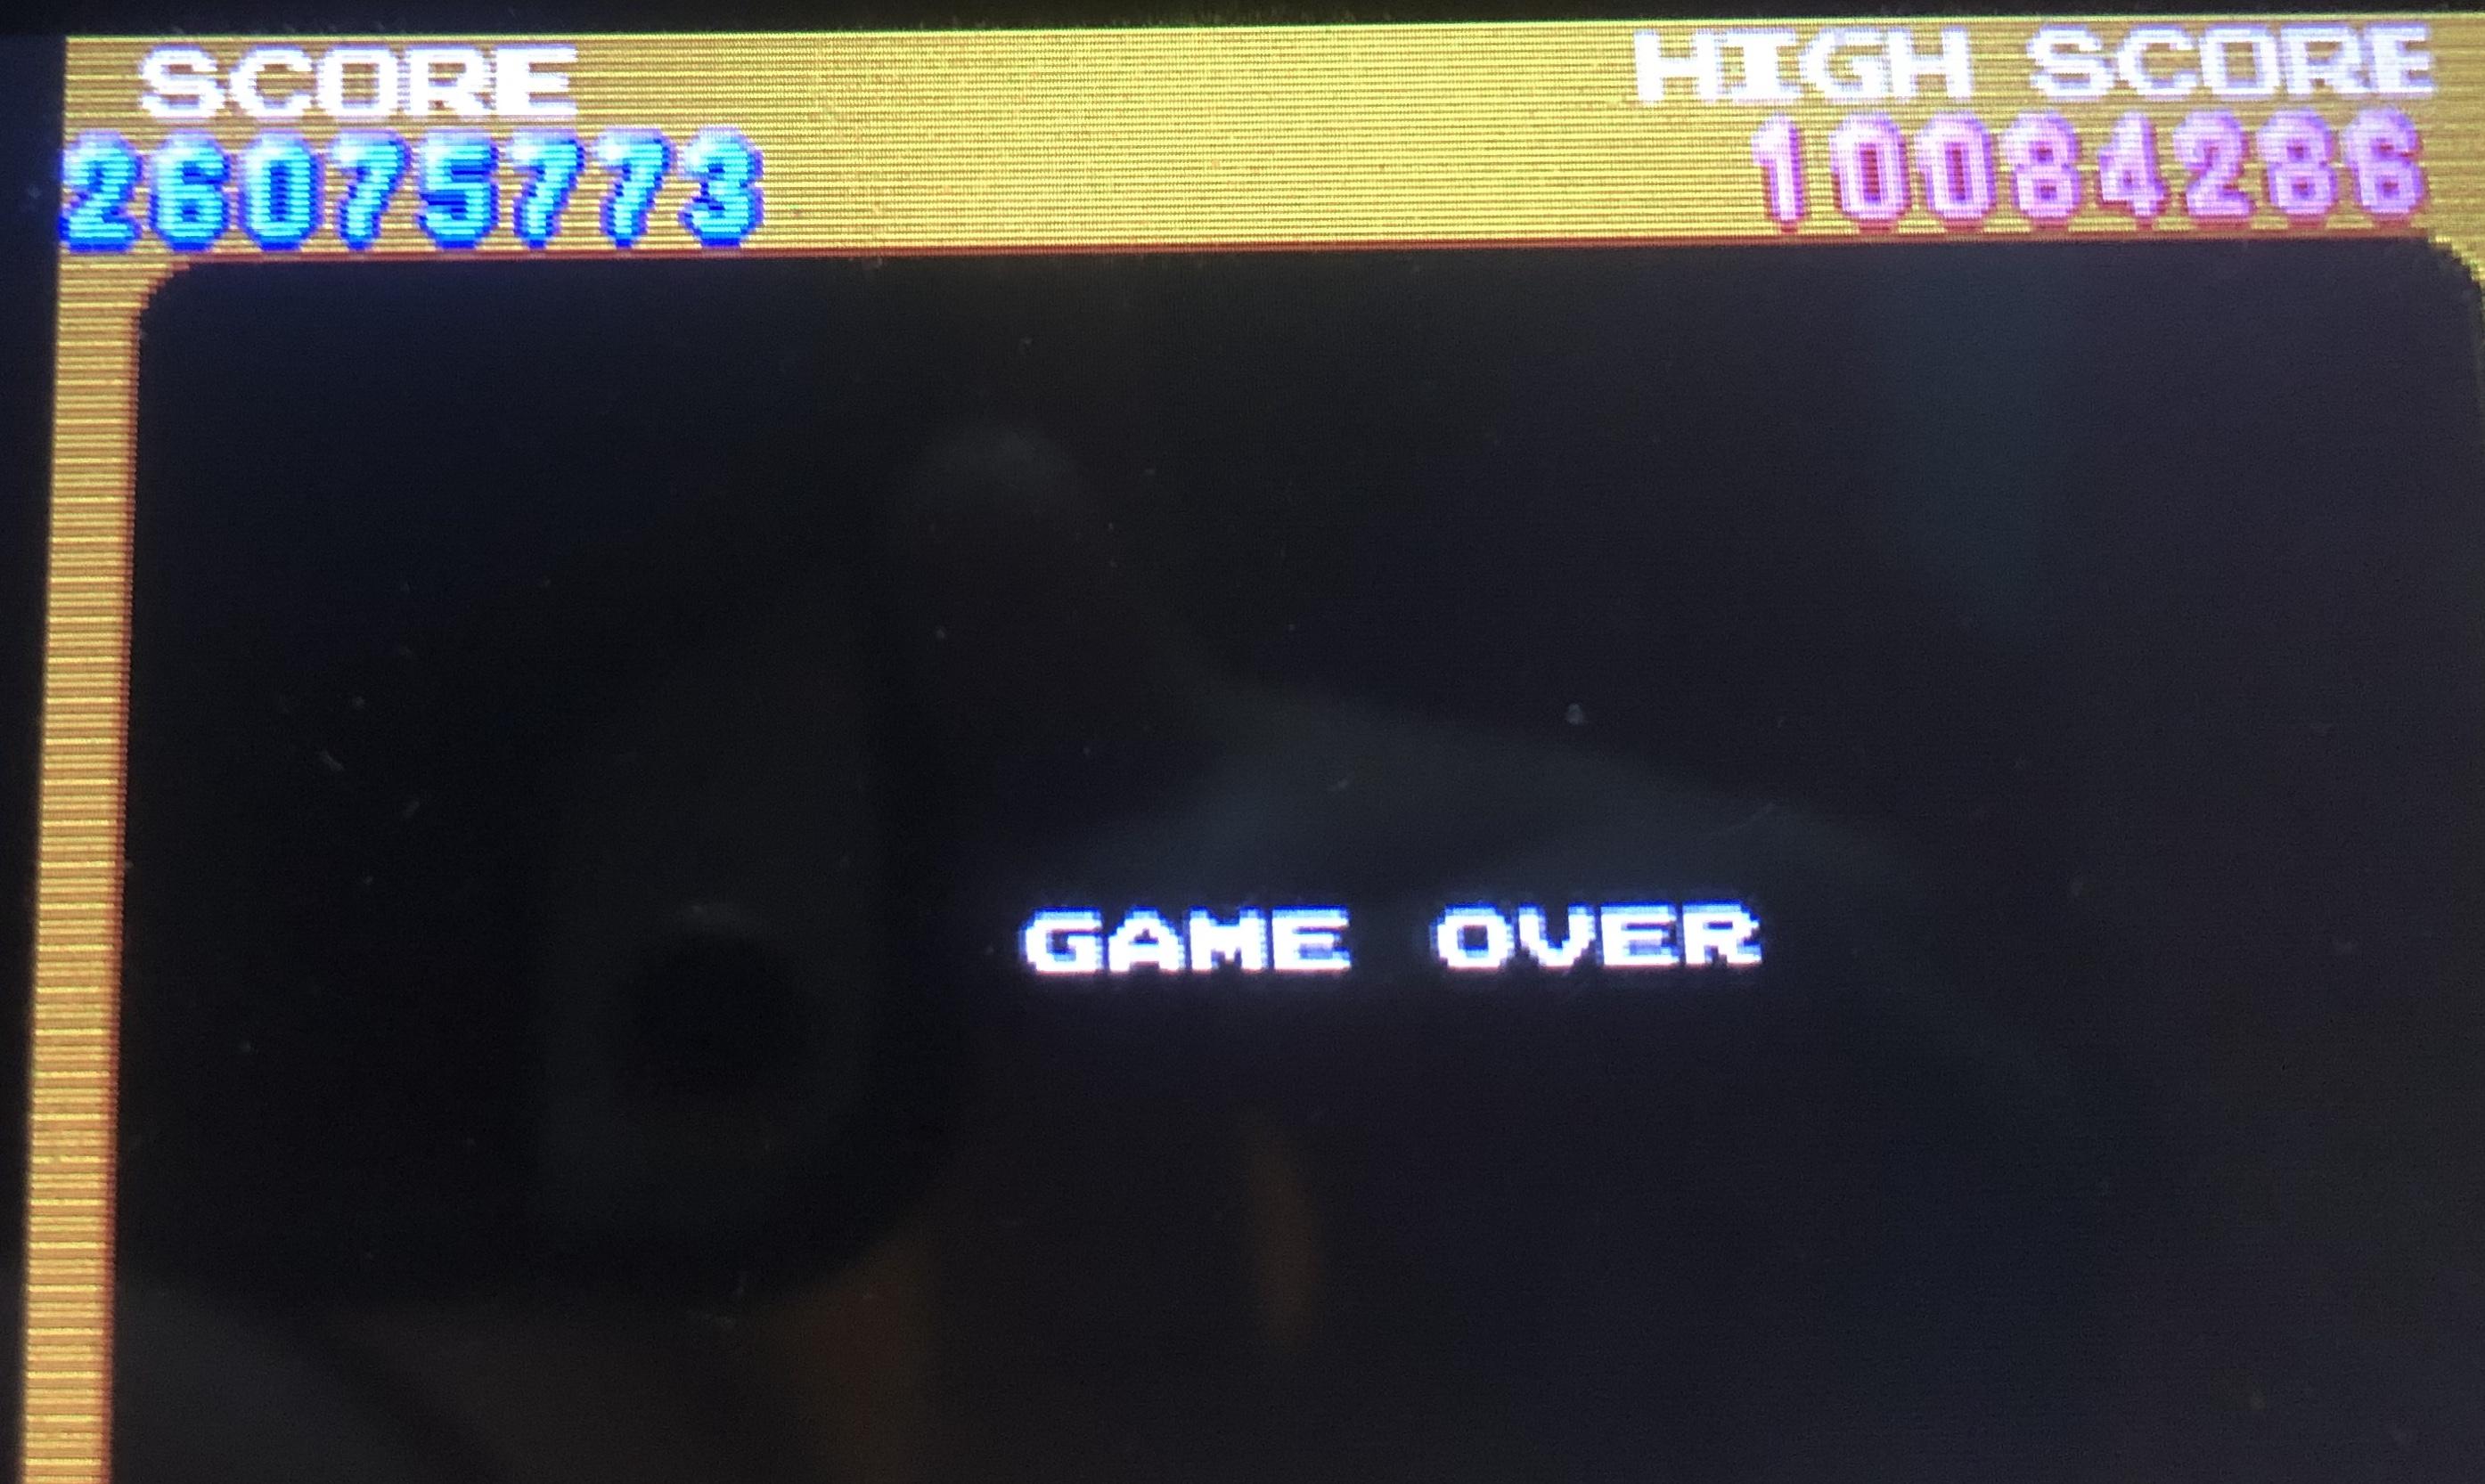 Elodie: Tetris DS Standard/Marathon [Endless On] (Nintendo DS) 26,075,773 points on 2020-02-13 21:55:26